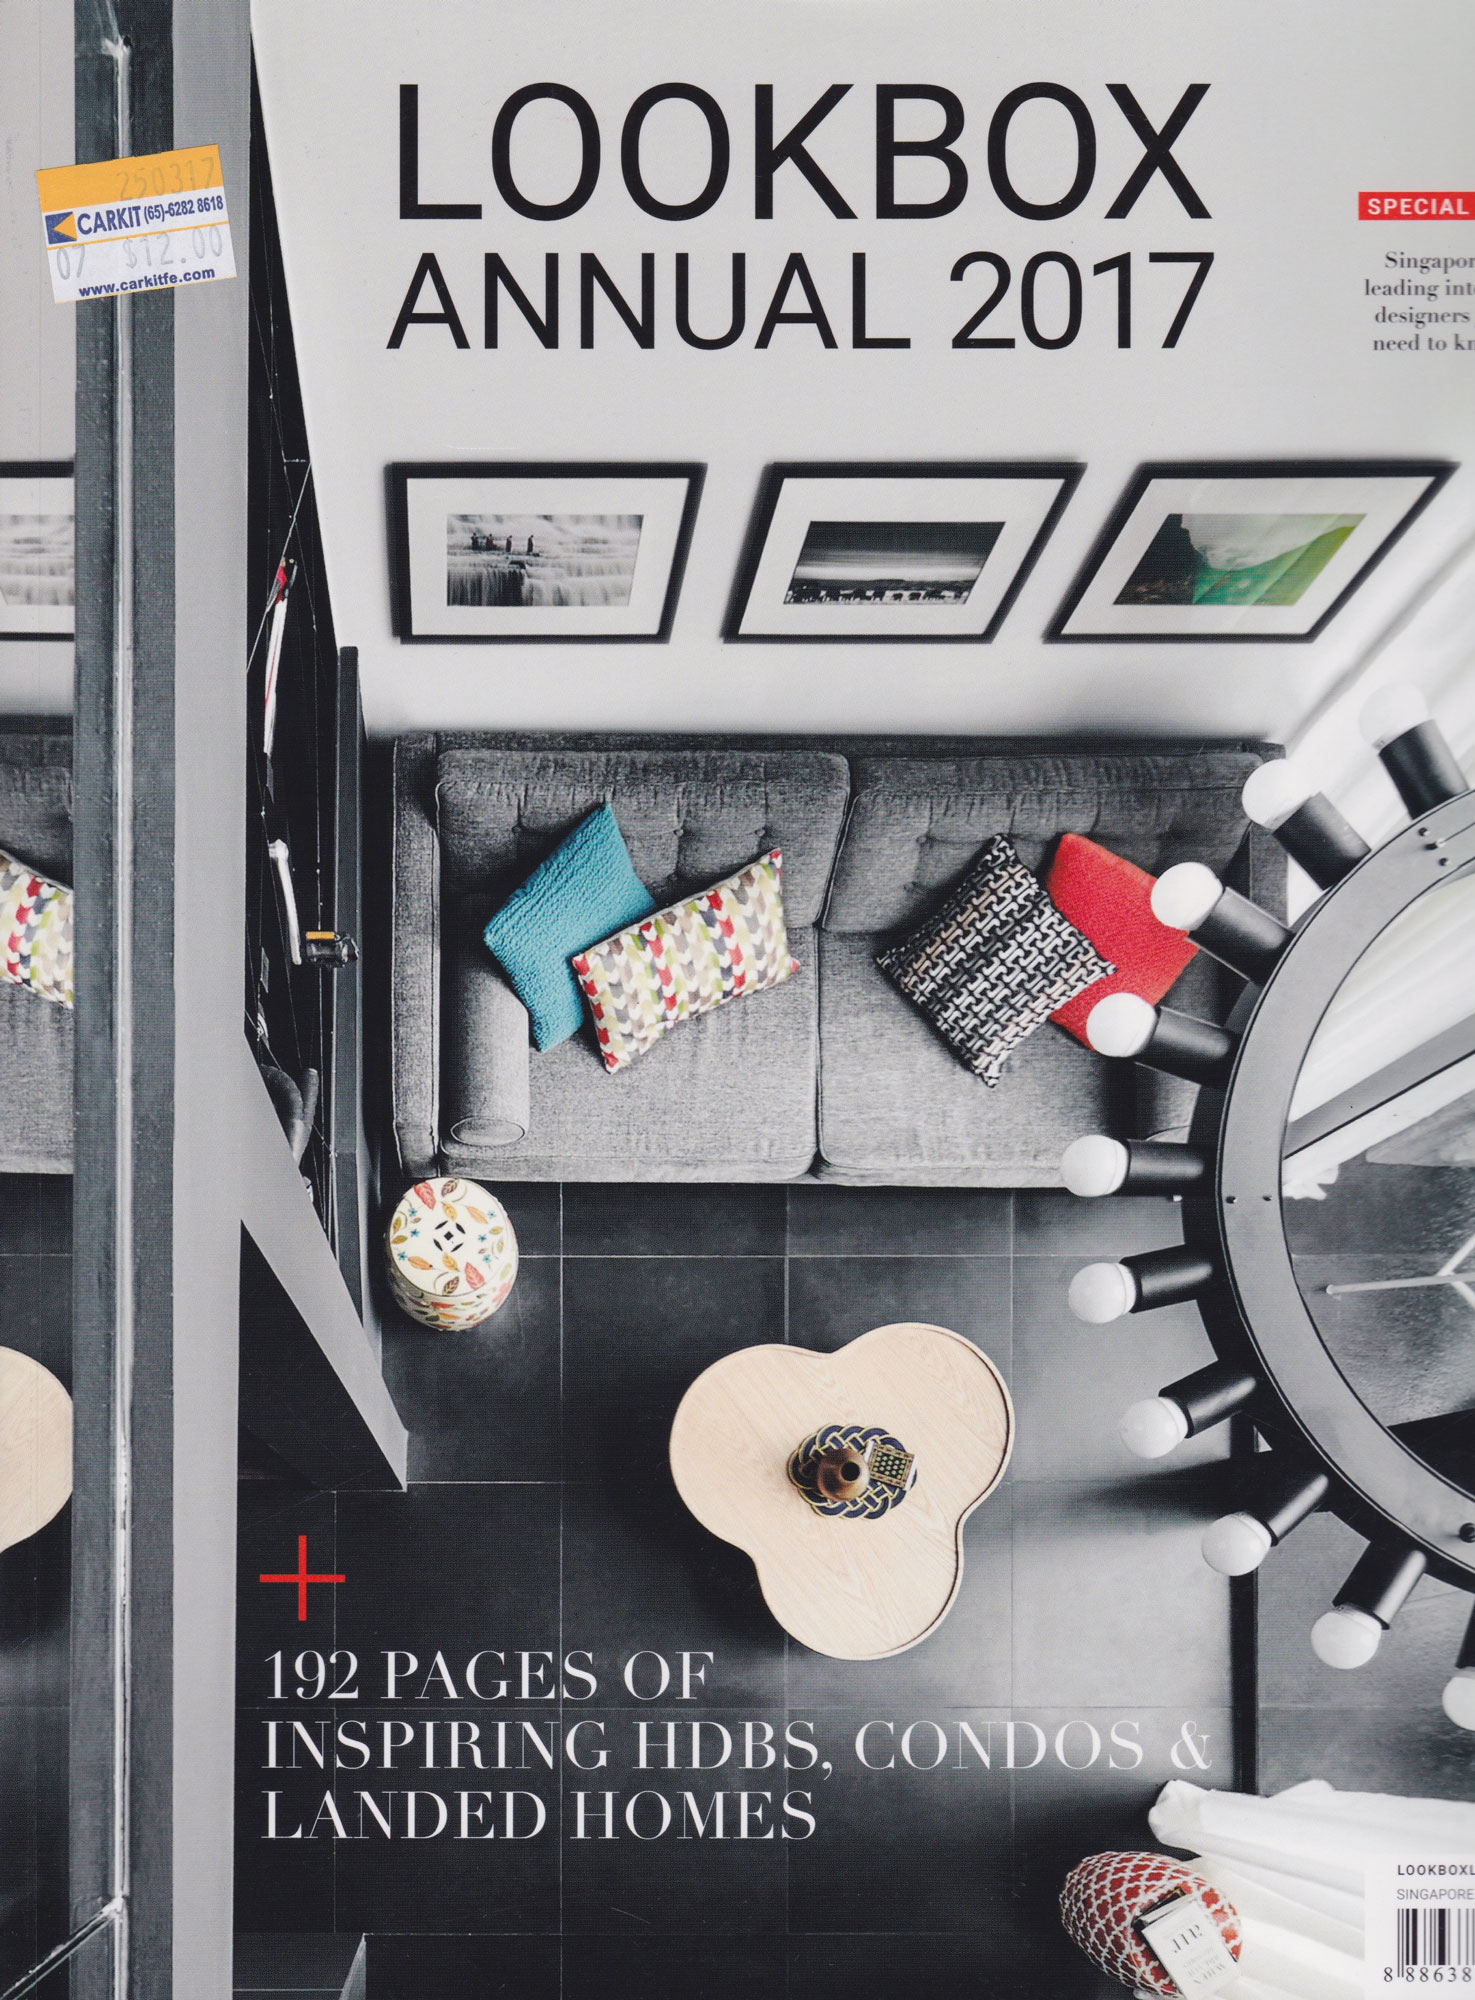 Lookbox-Annual-2017-Cover.jpg